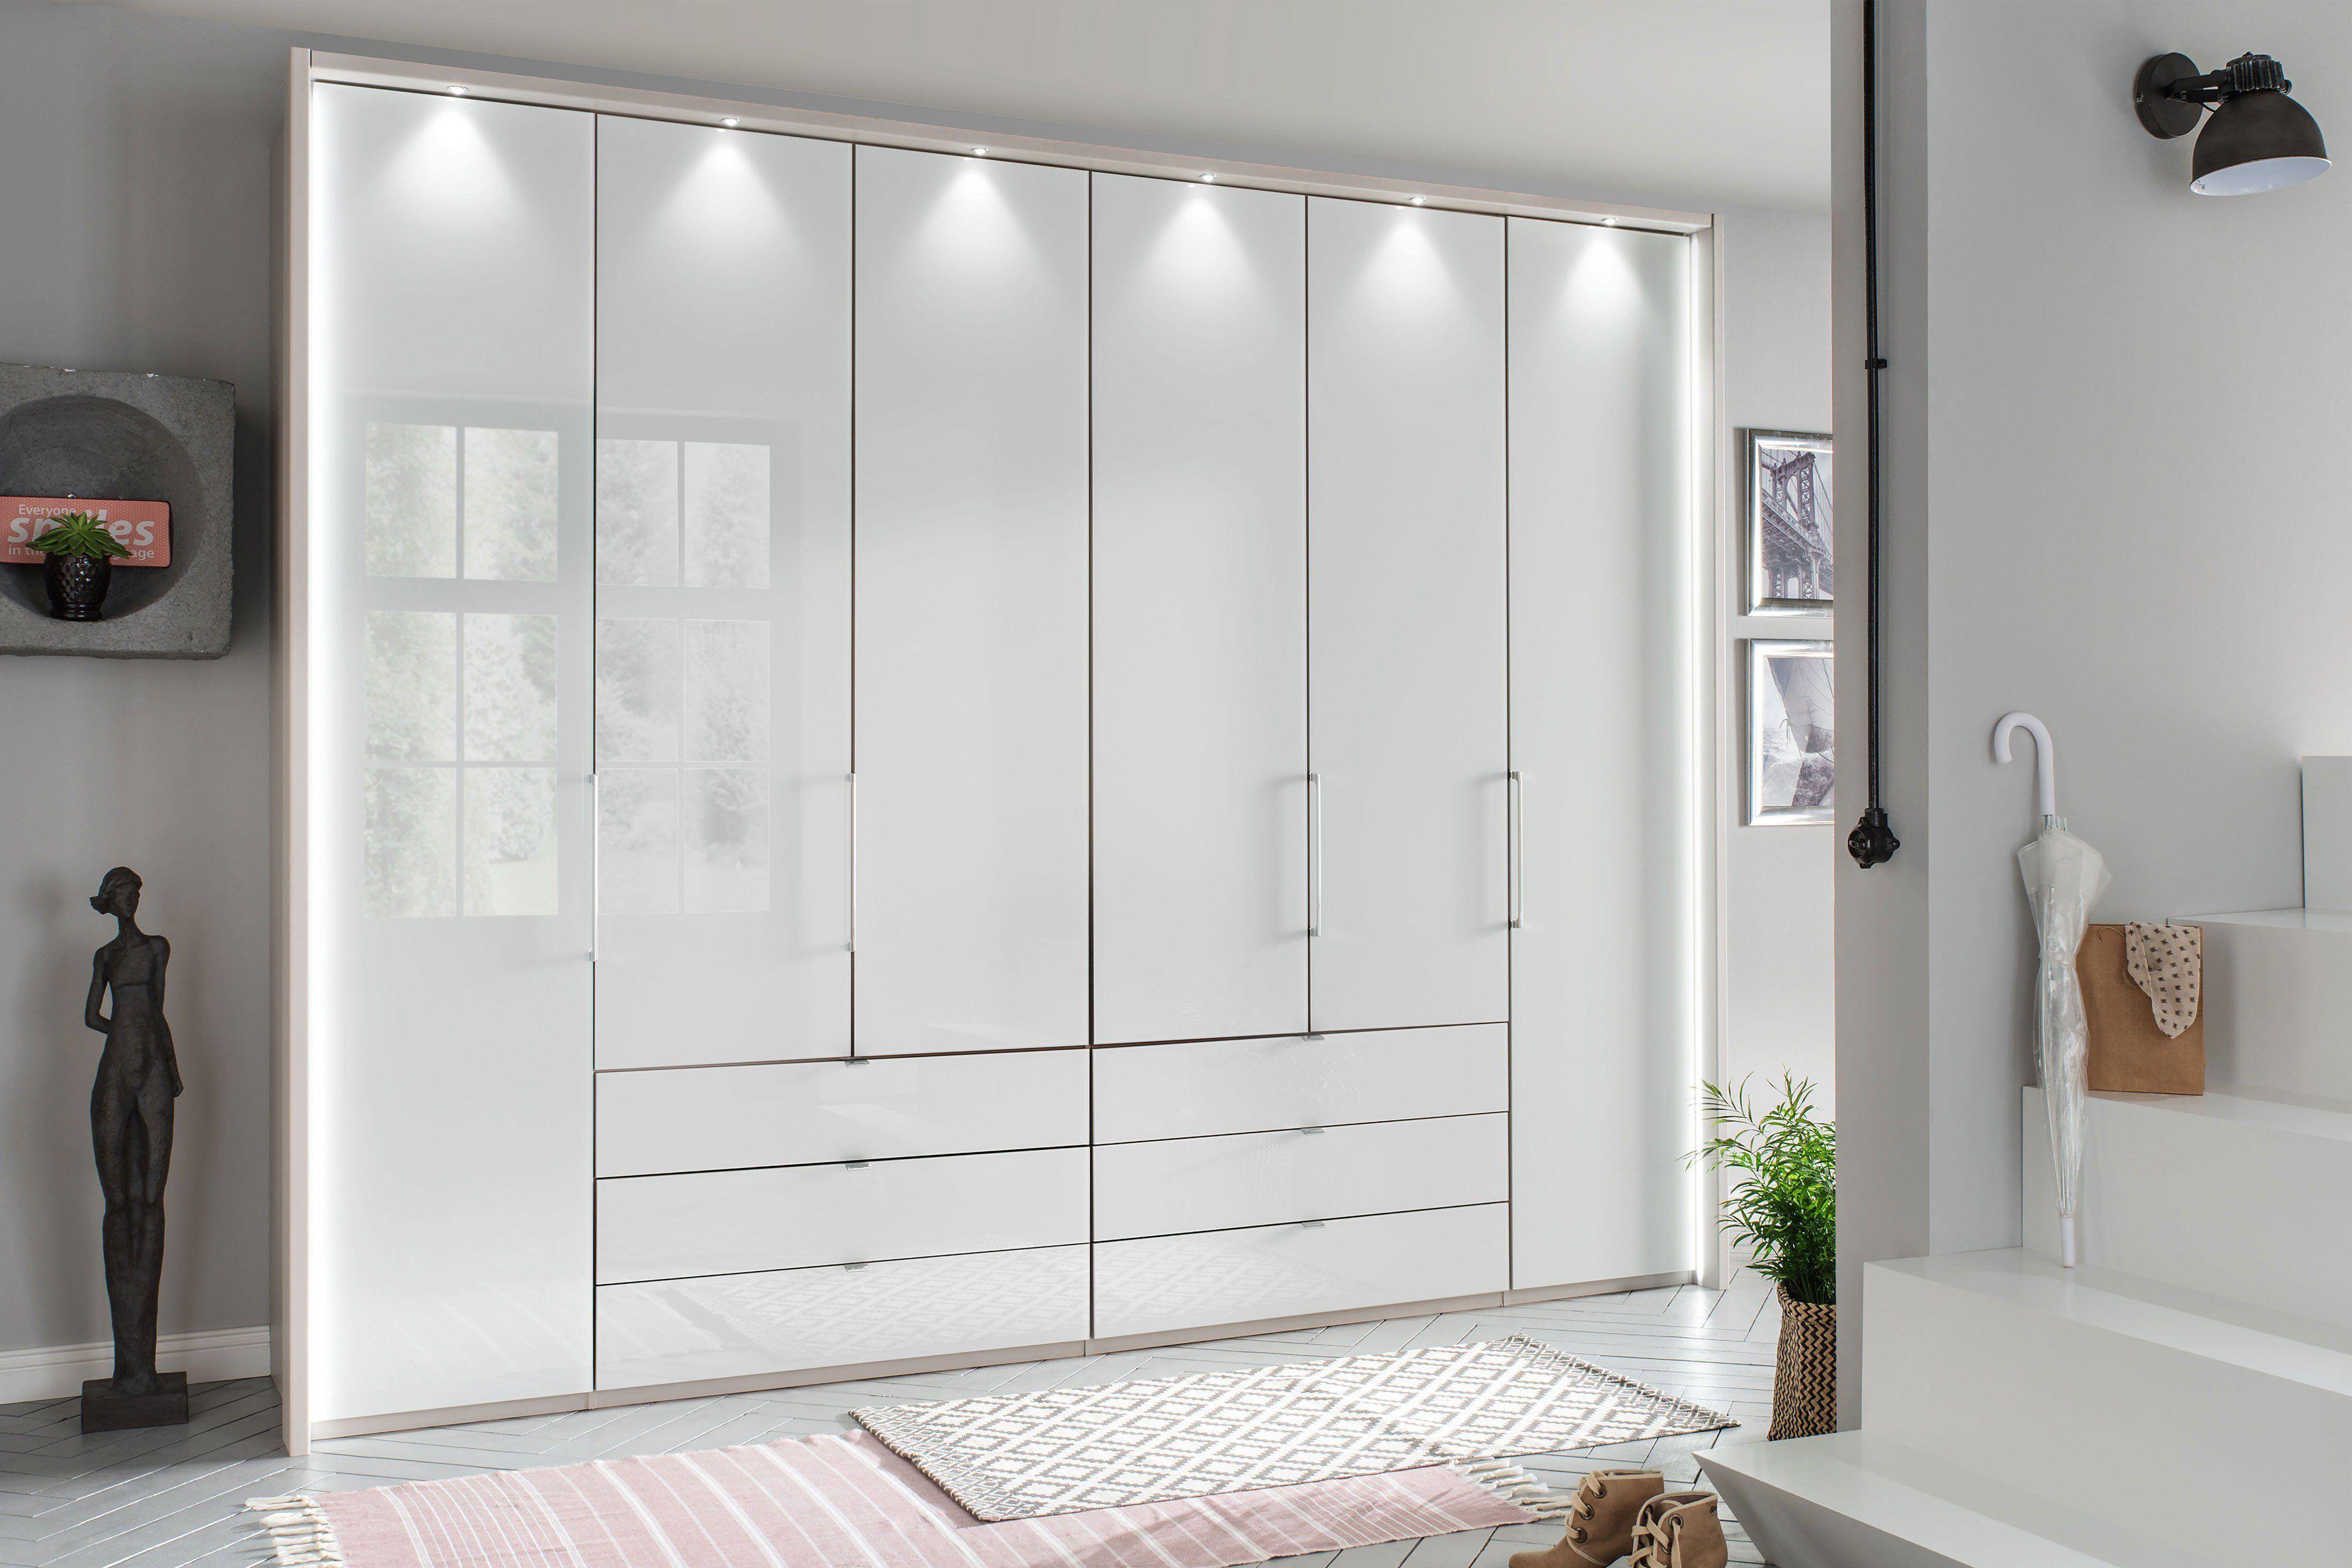 Kleiderschrank Lamellentüren Ikea.Pin On Kleiderschrank